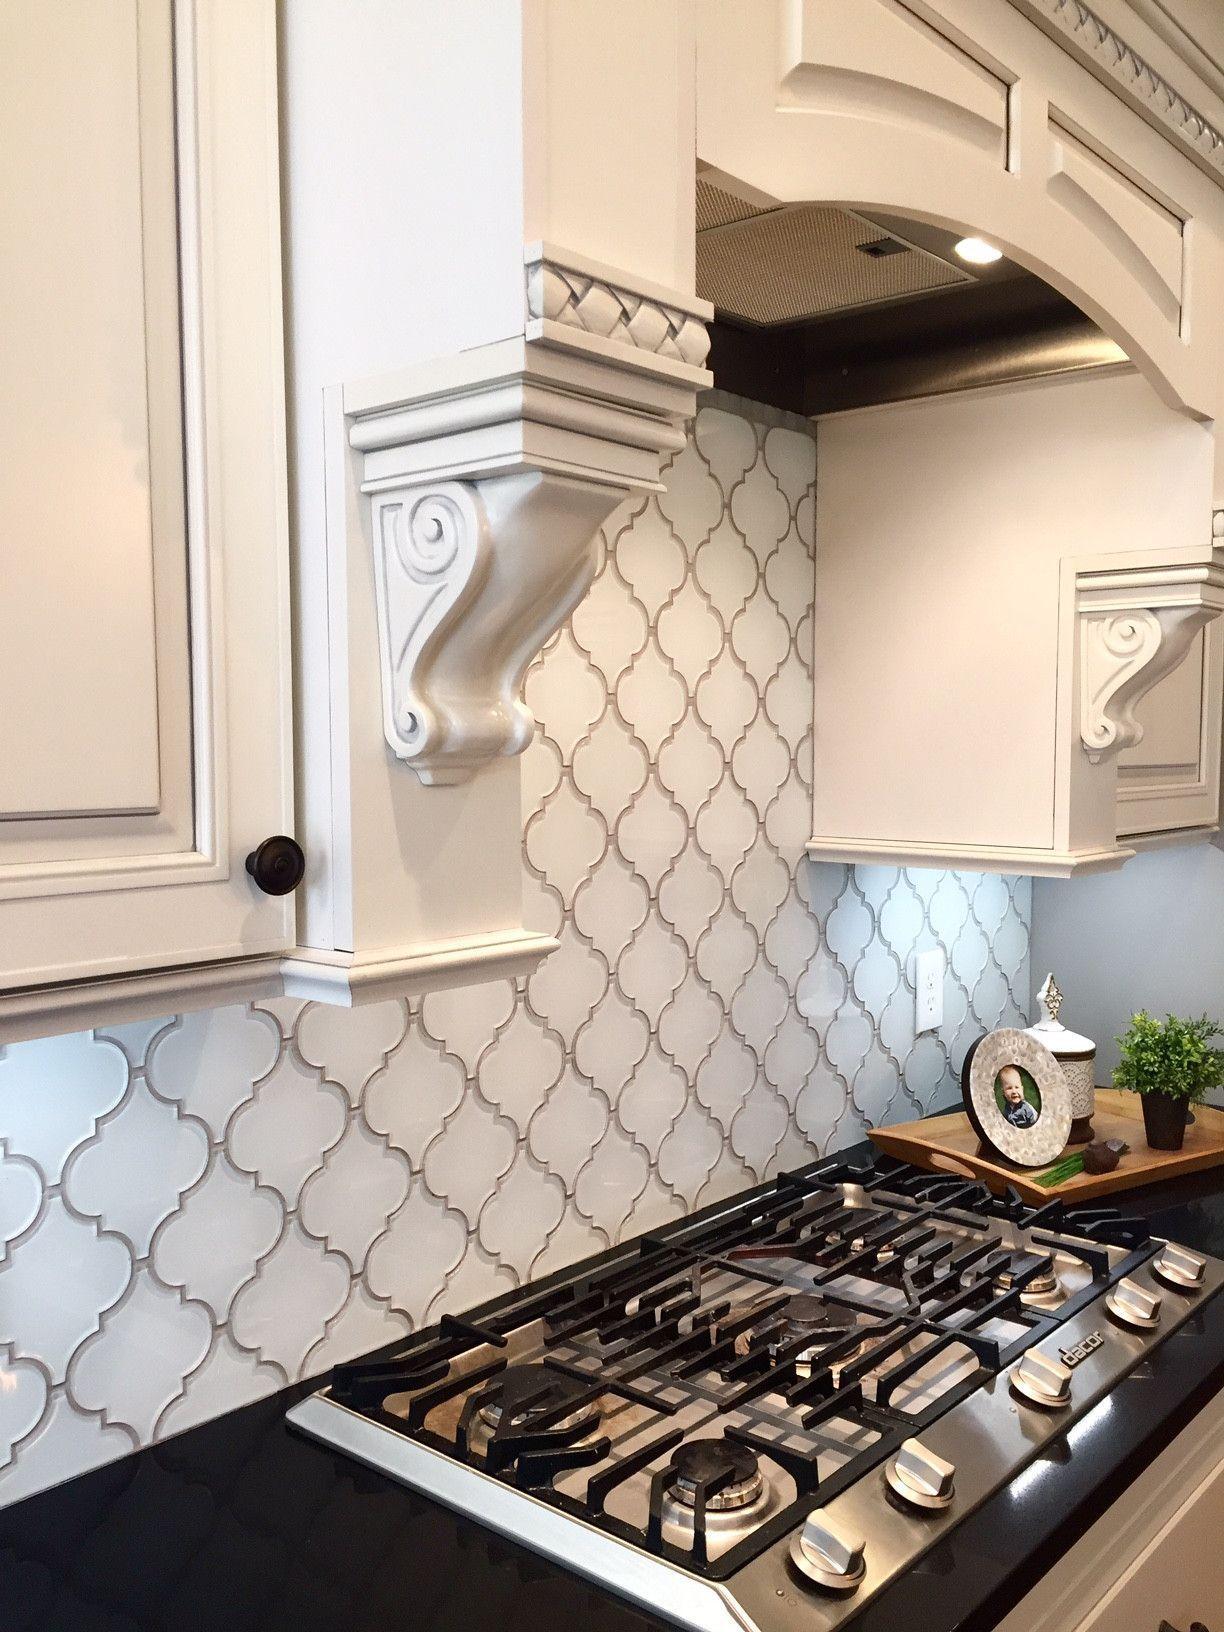 ceiling fan subway kitchen backsplash ideas 34 increadible kitchen backsplash tile ideas kitchen